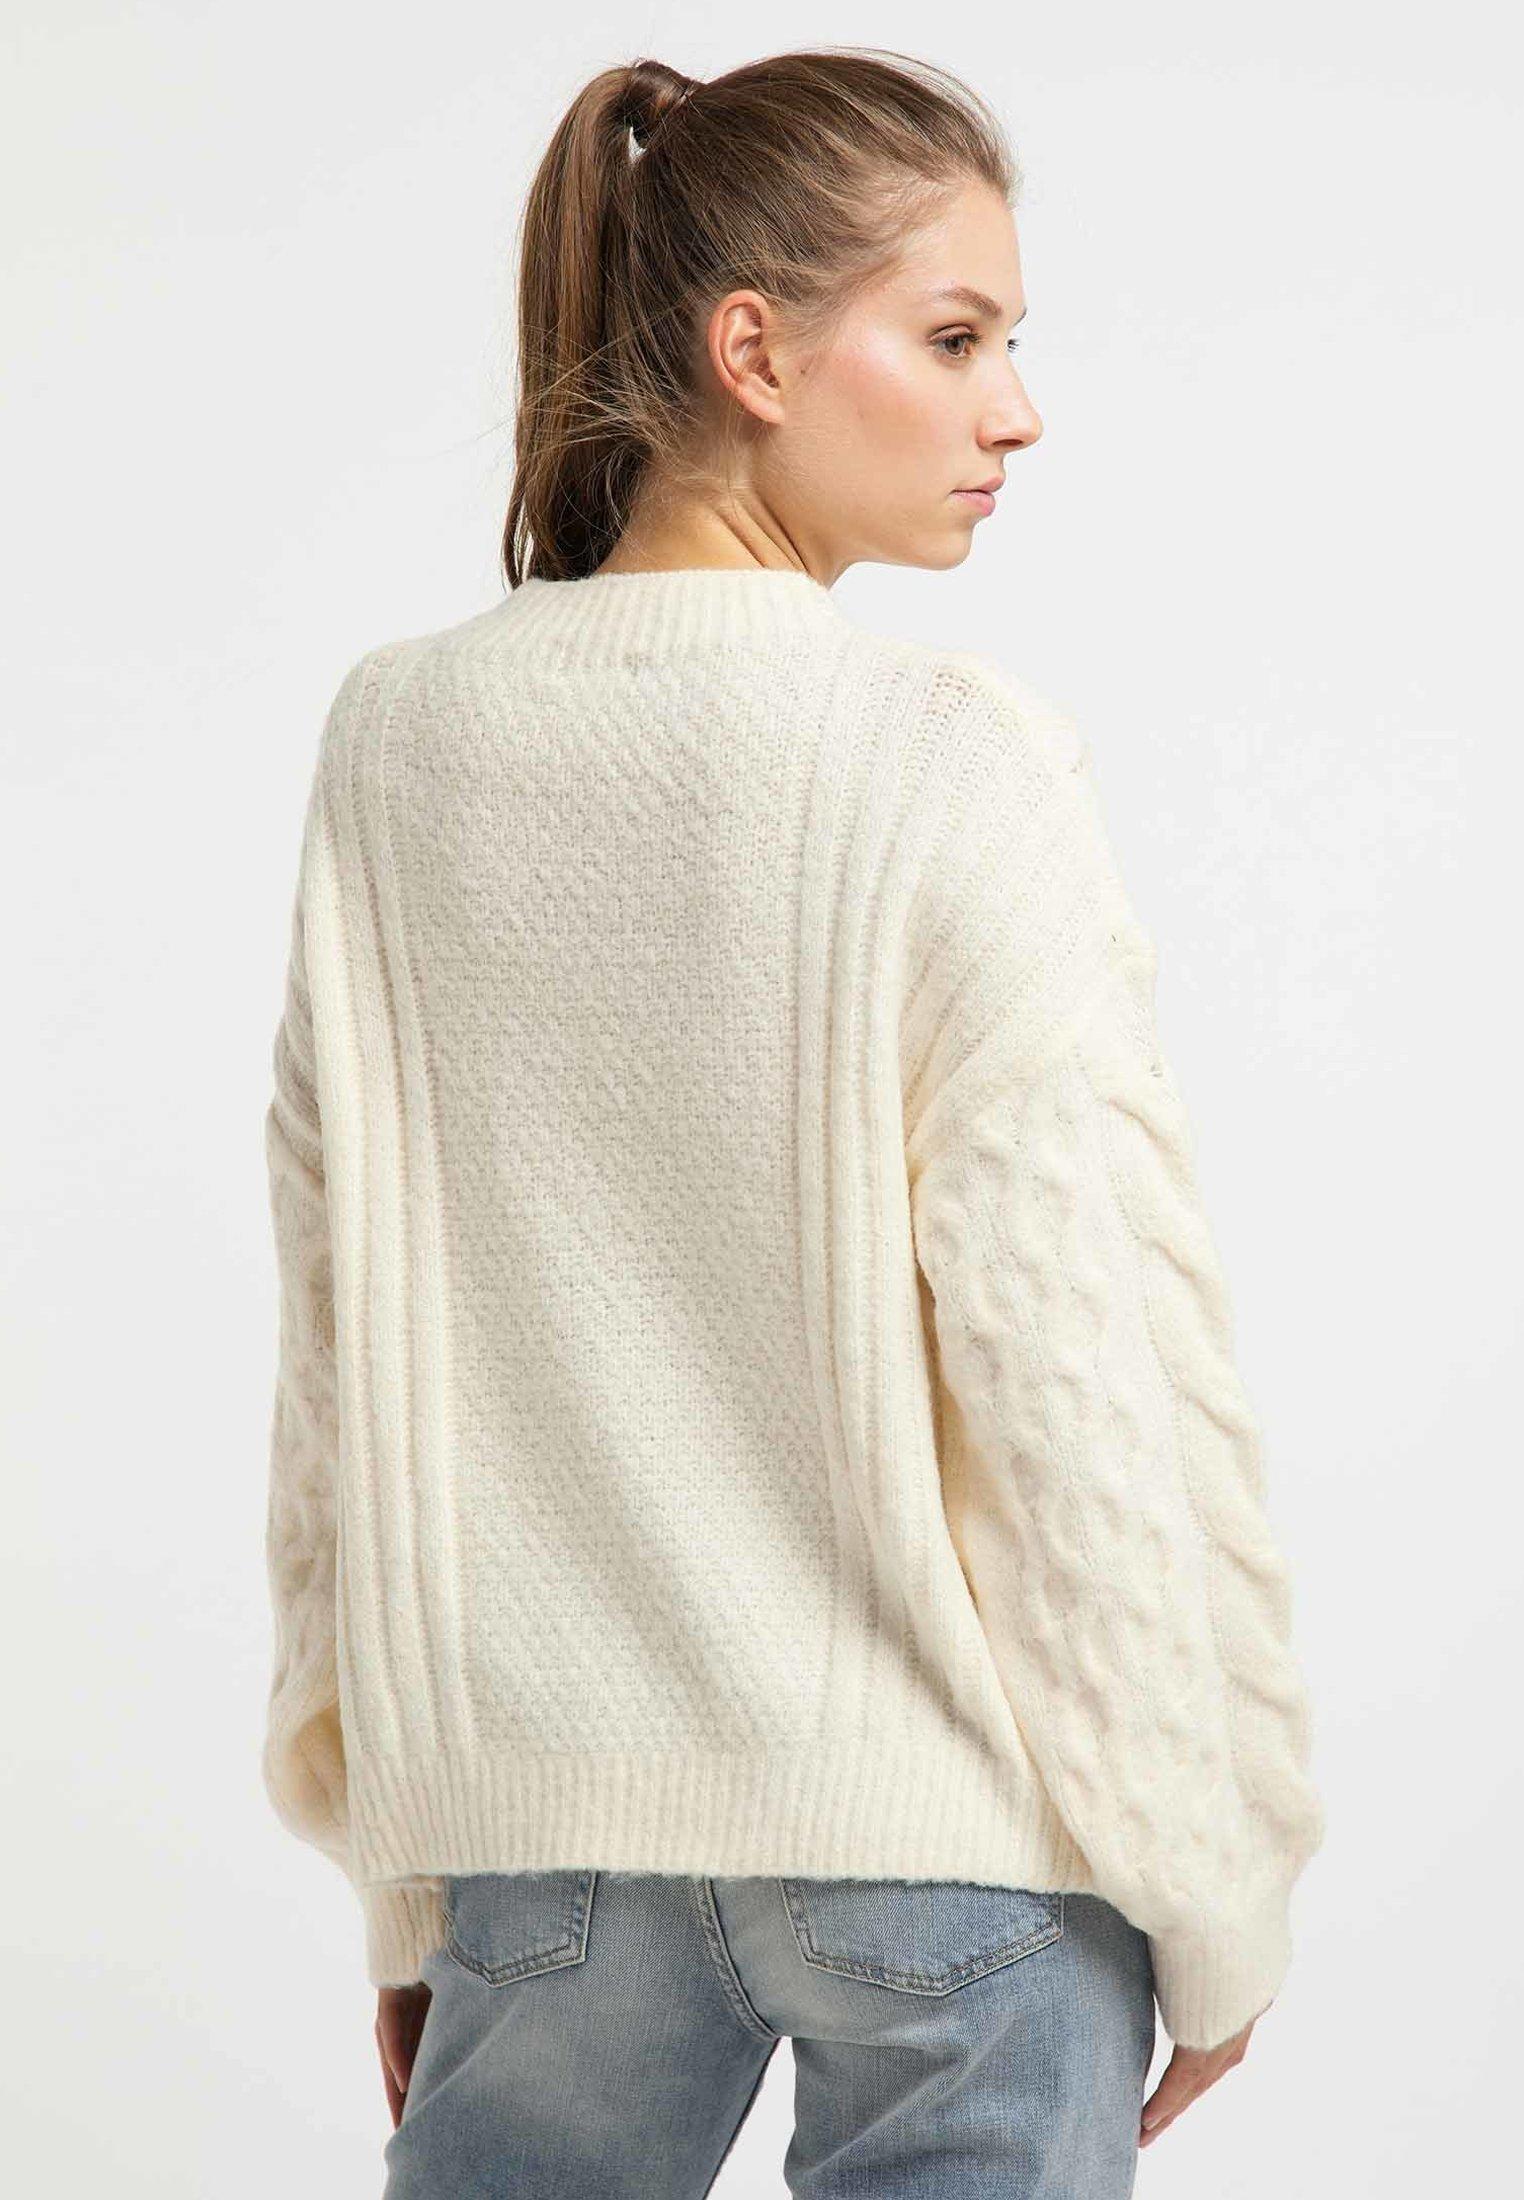 myMo Jumper - wollweiss - Women's winter clothes DLbxw